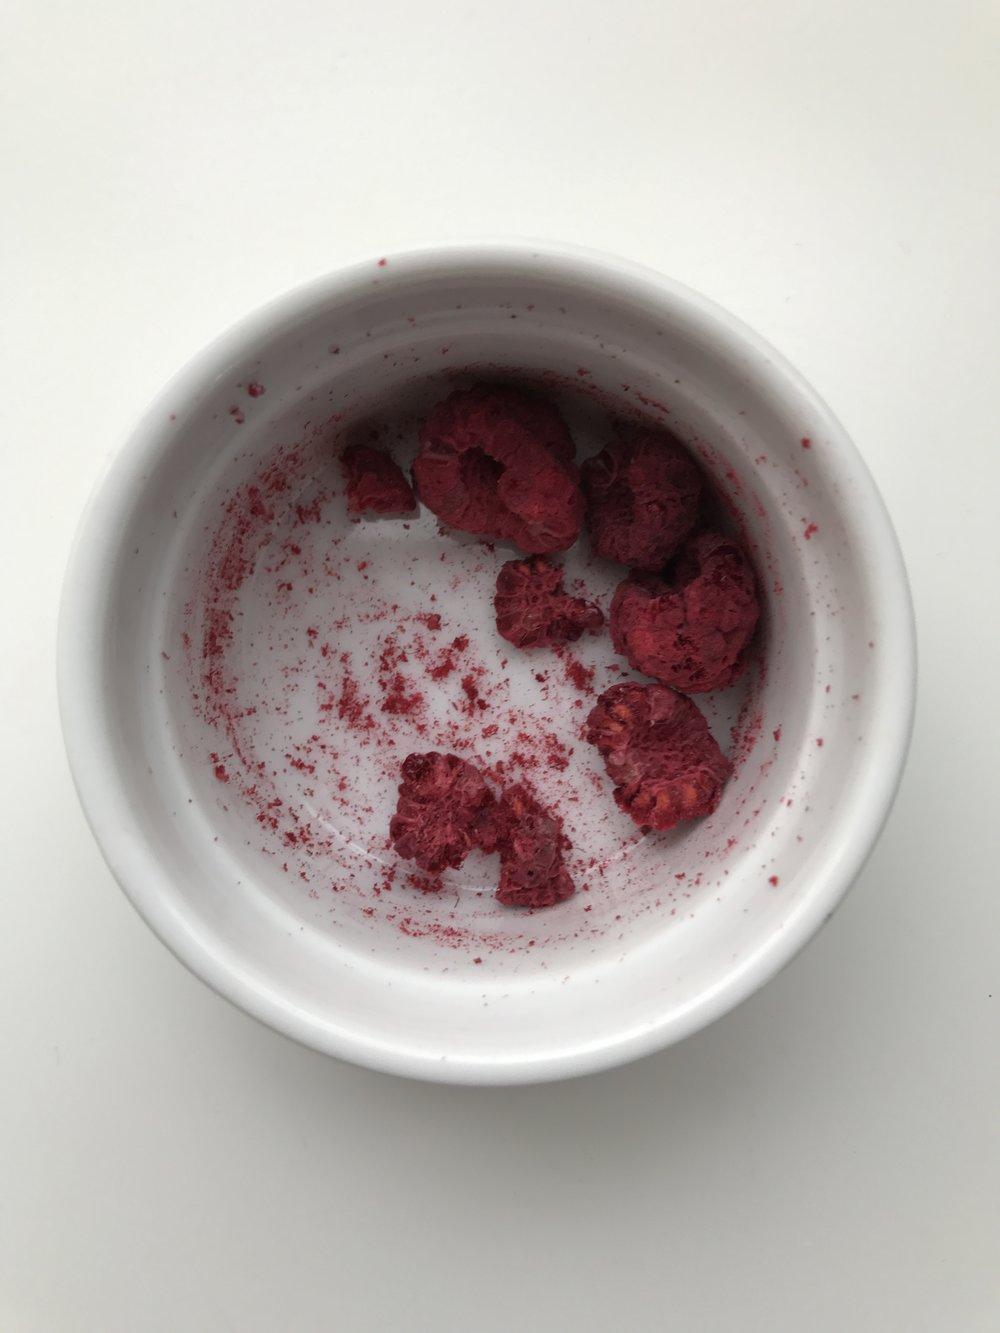 freeze dried raspberries 6.jpg